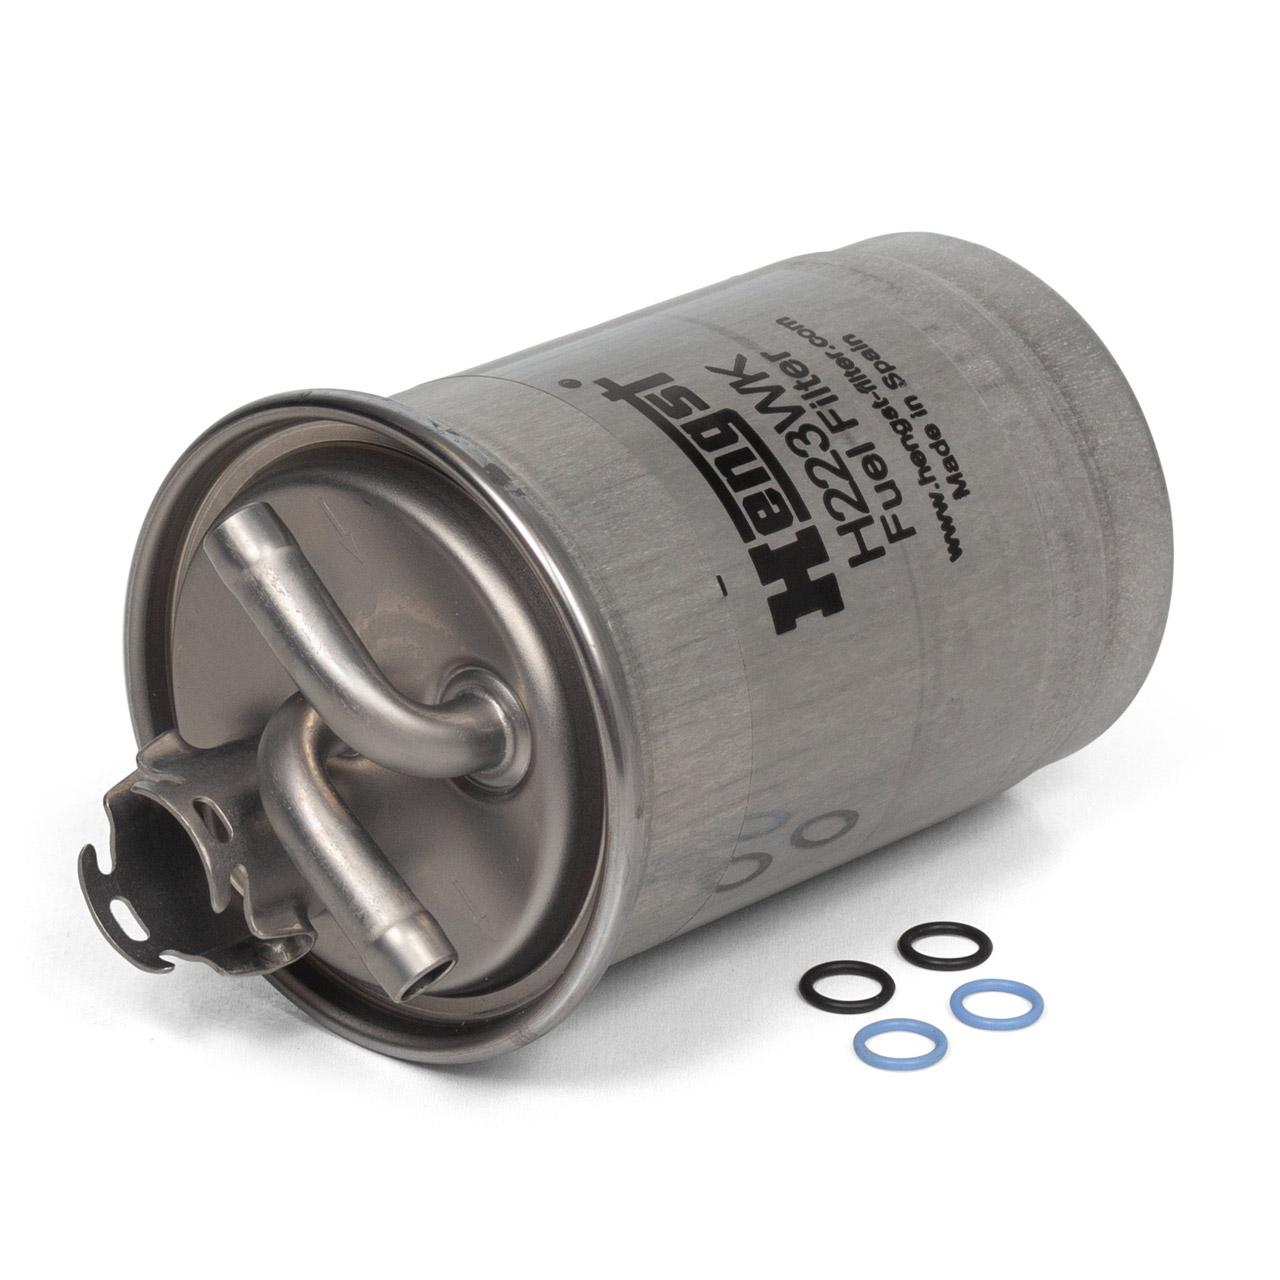 HENGST H223WK Kraftstofffilter für AUDI A4 (B7) A6 (C6) 2.0 TDI 121-170 PS